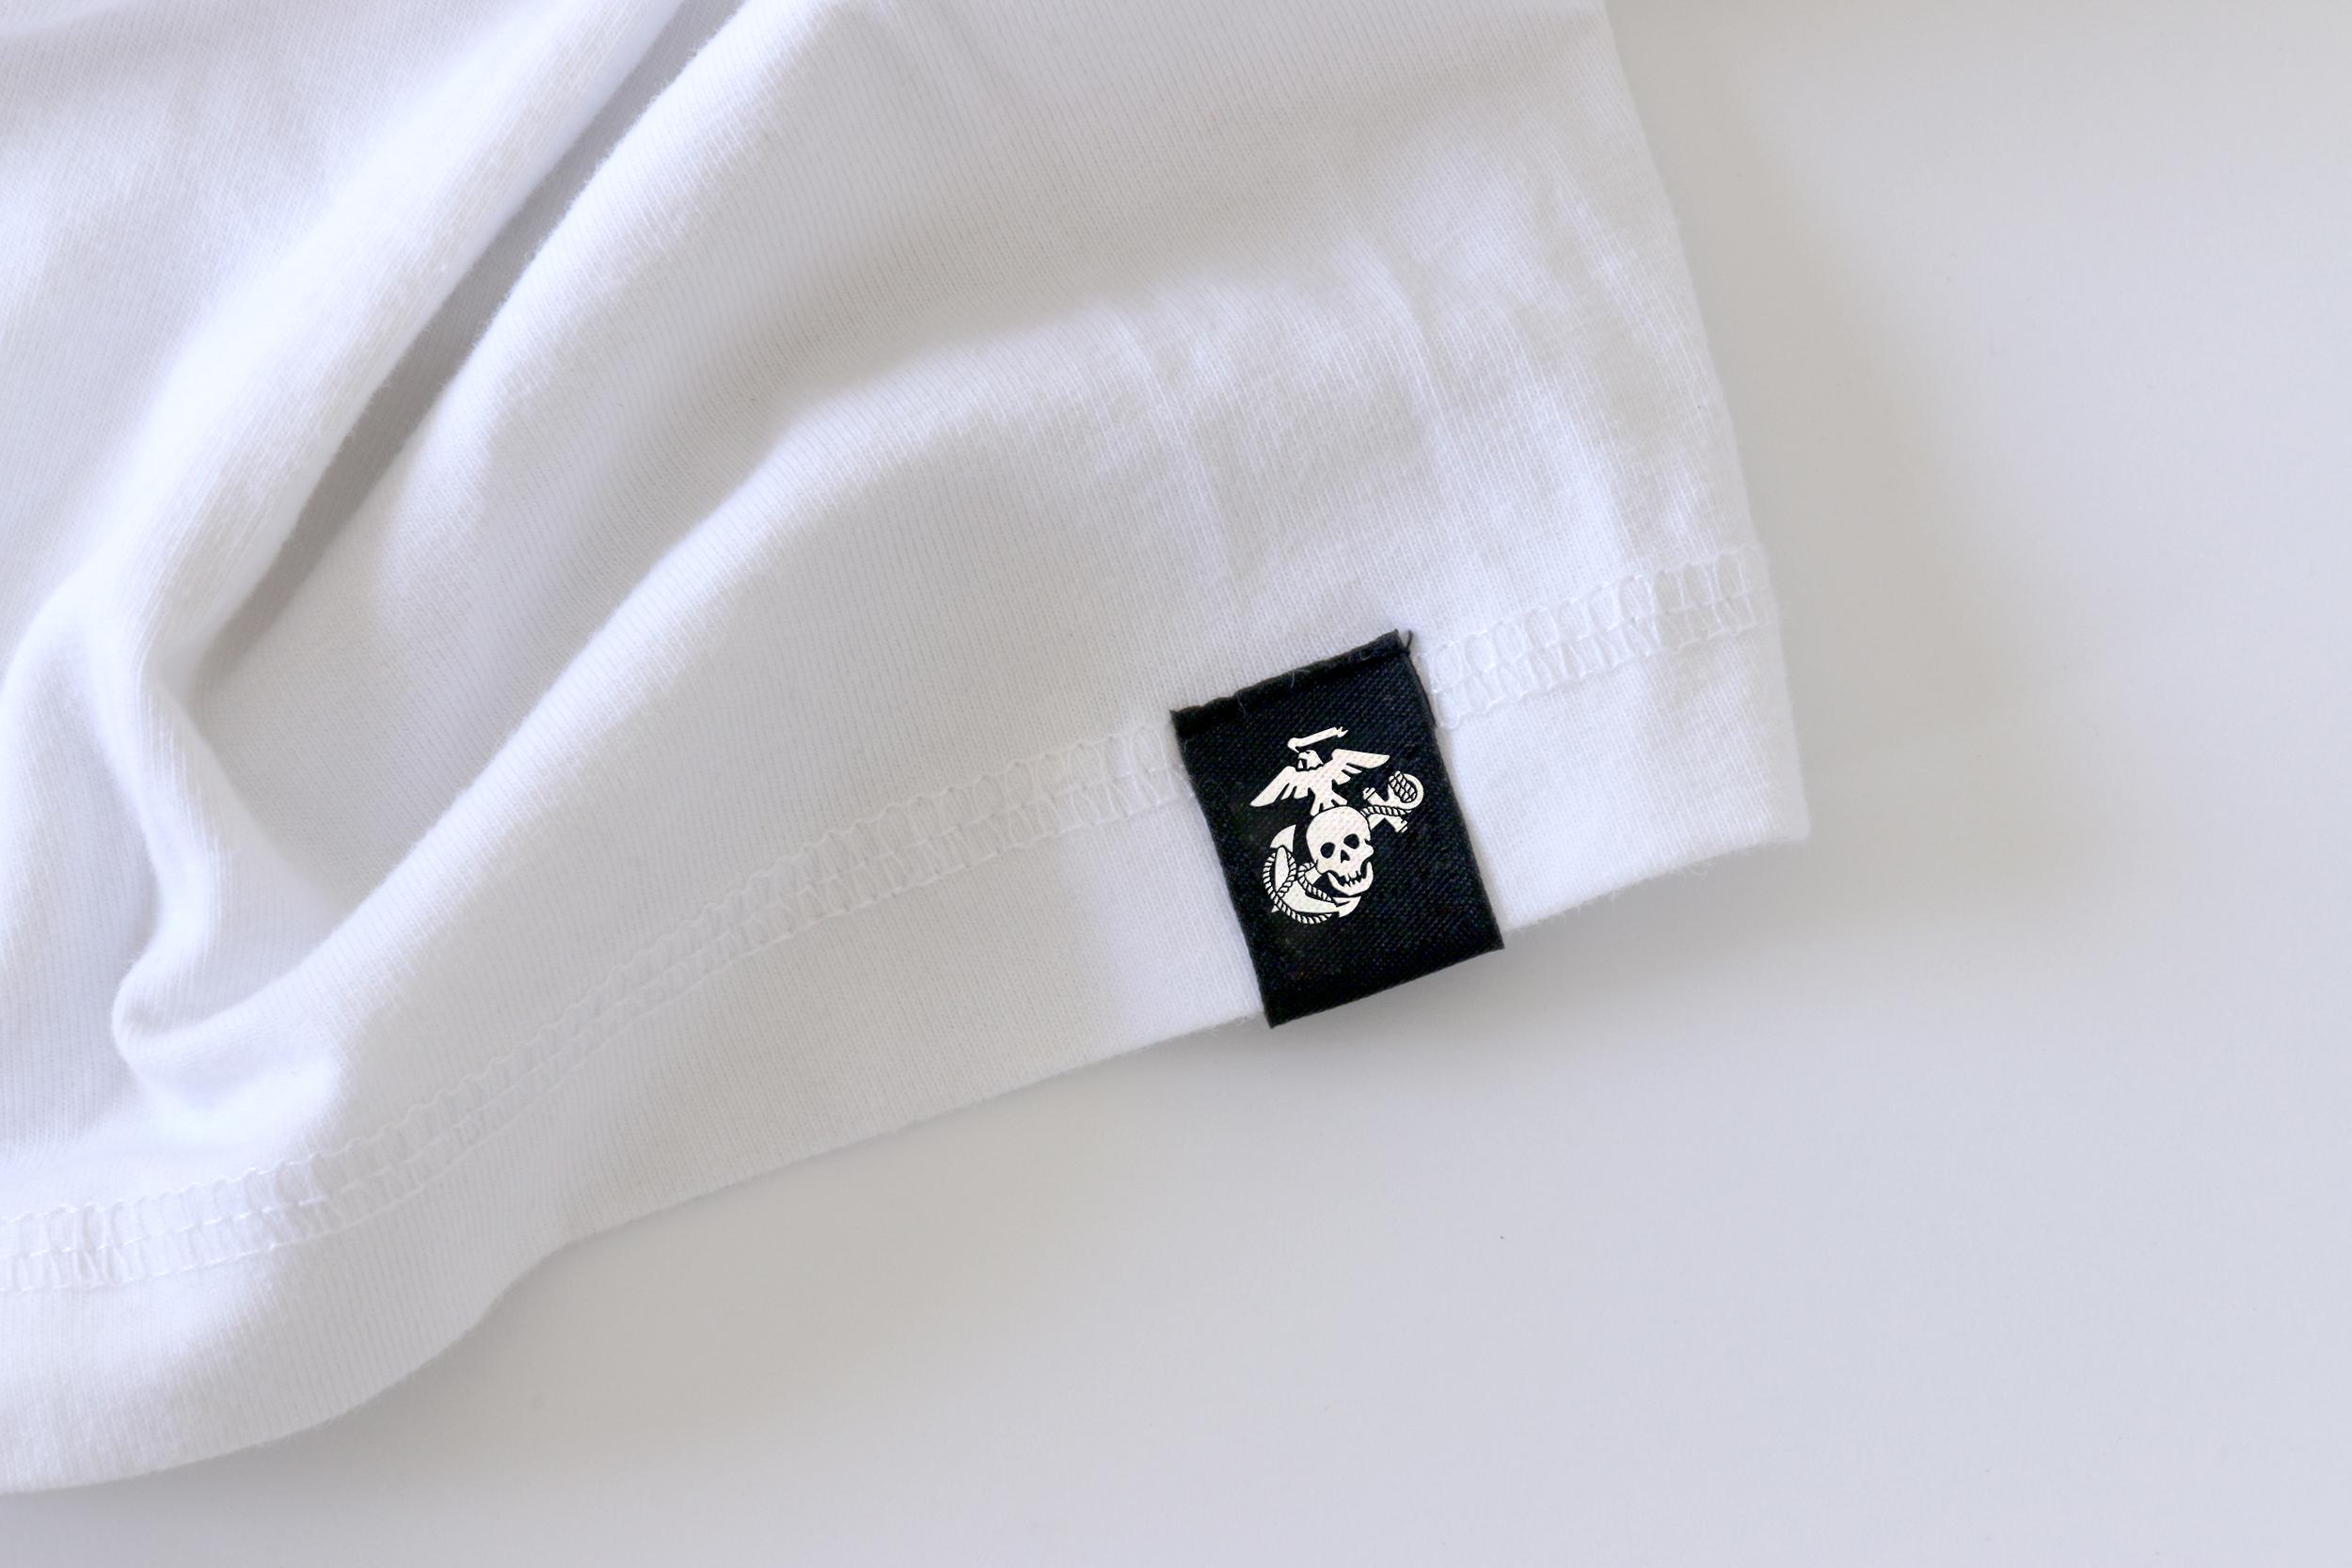 USMC Eagle Skull and Anchor Tag on Marine Shirt